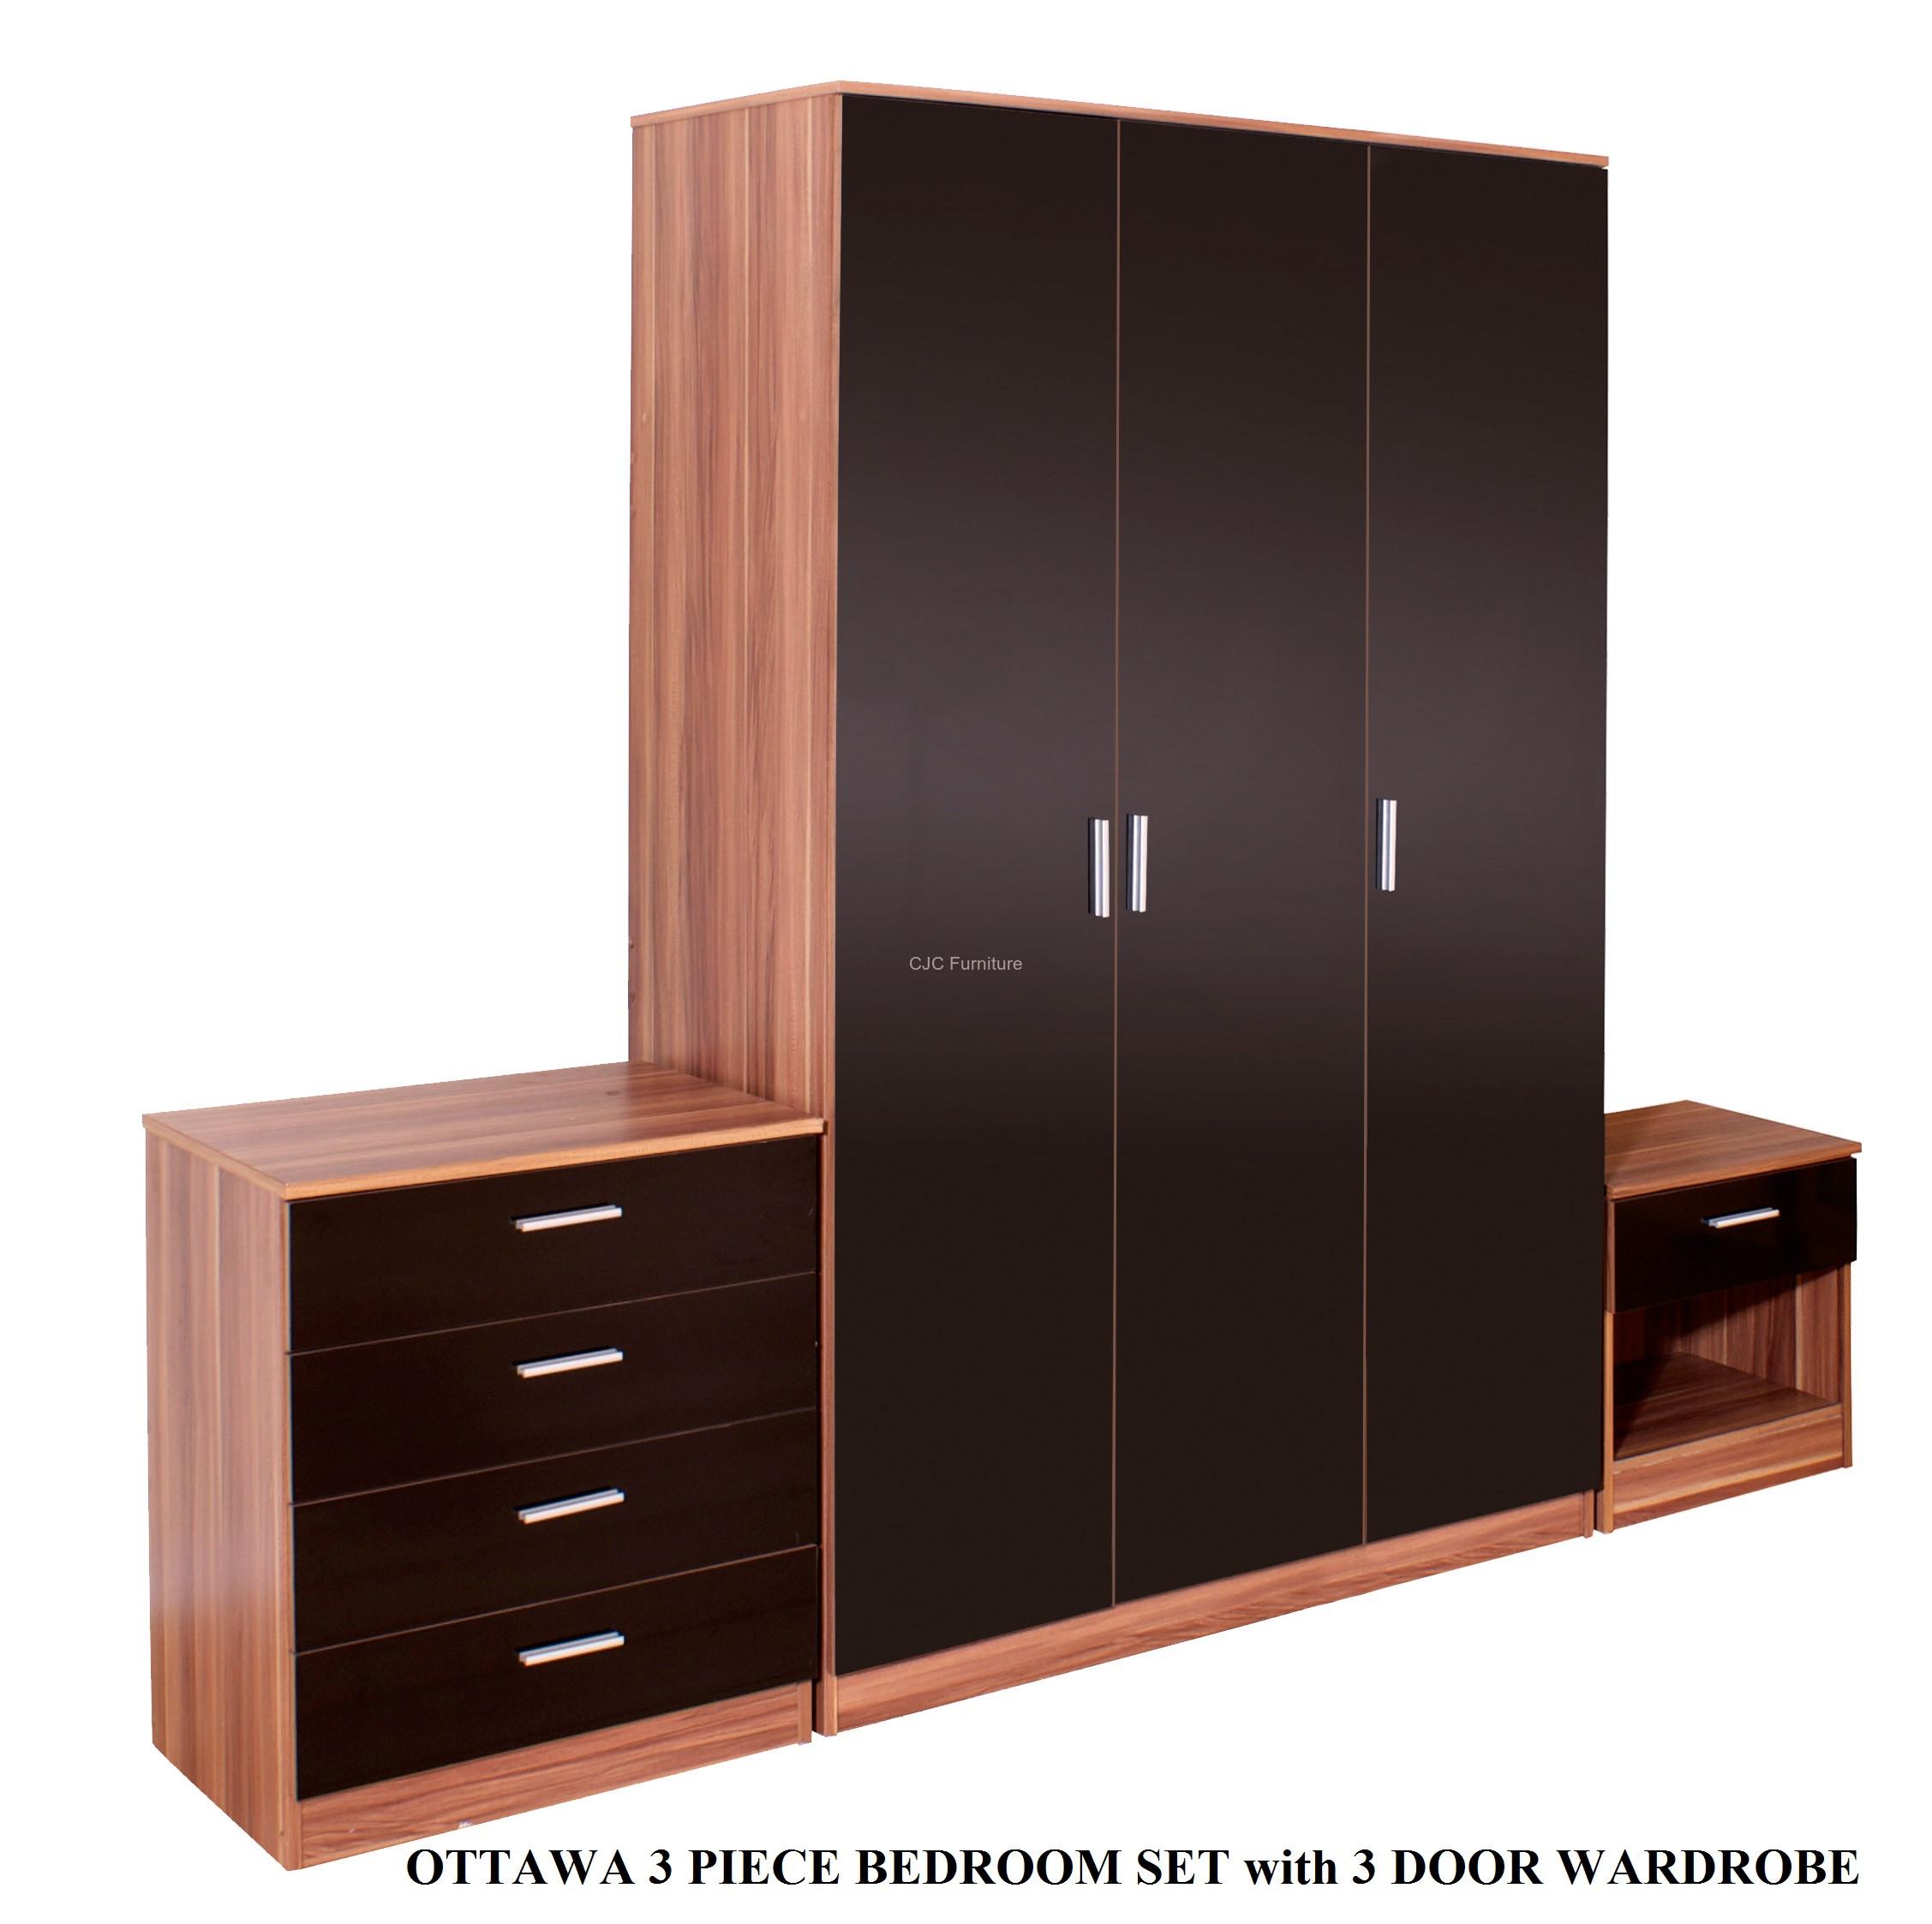 wardrobe sets bedroom set with wardrobe photo - 5 PBETFQF